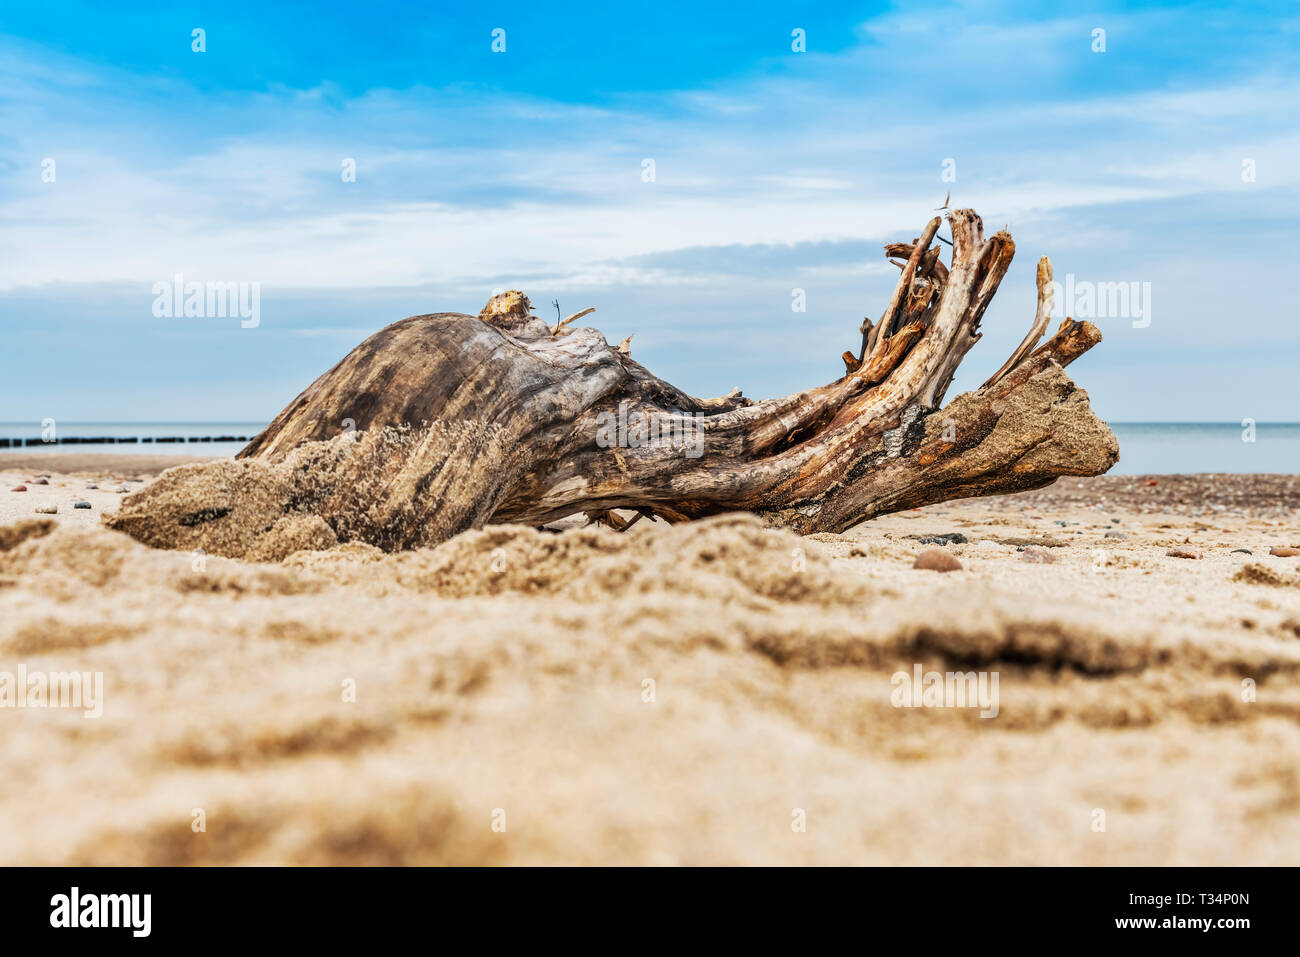 A tree root lies on the beach of the Baltic Sea, Kolobrzeg, West Pomeranian, Poland, Europe - Stock Image